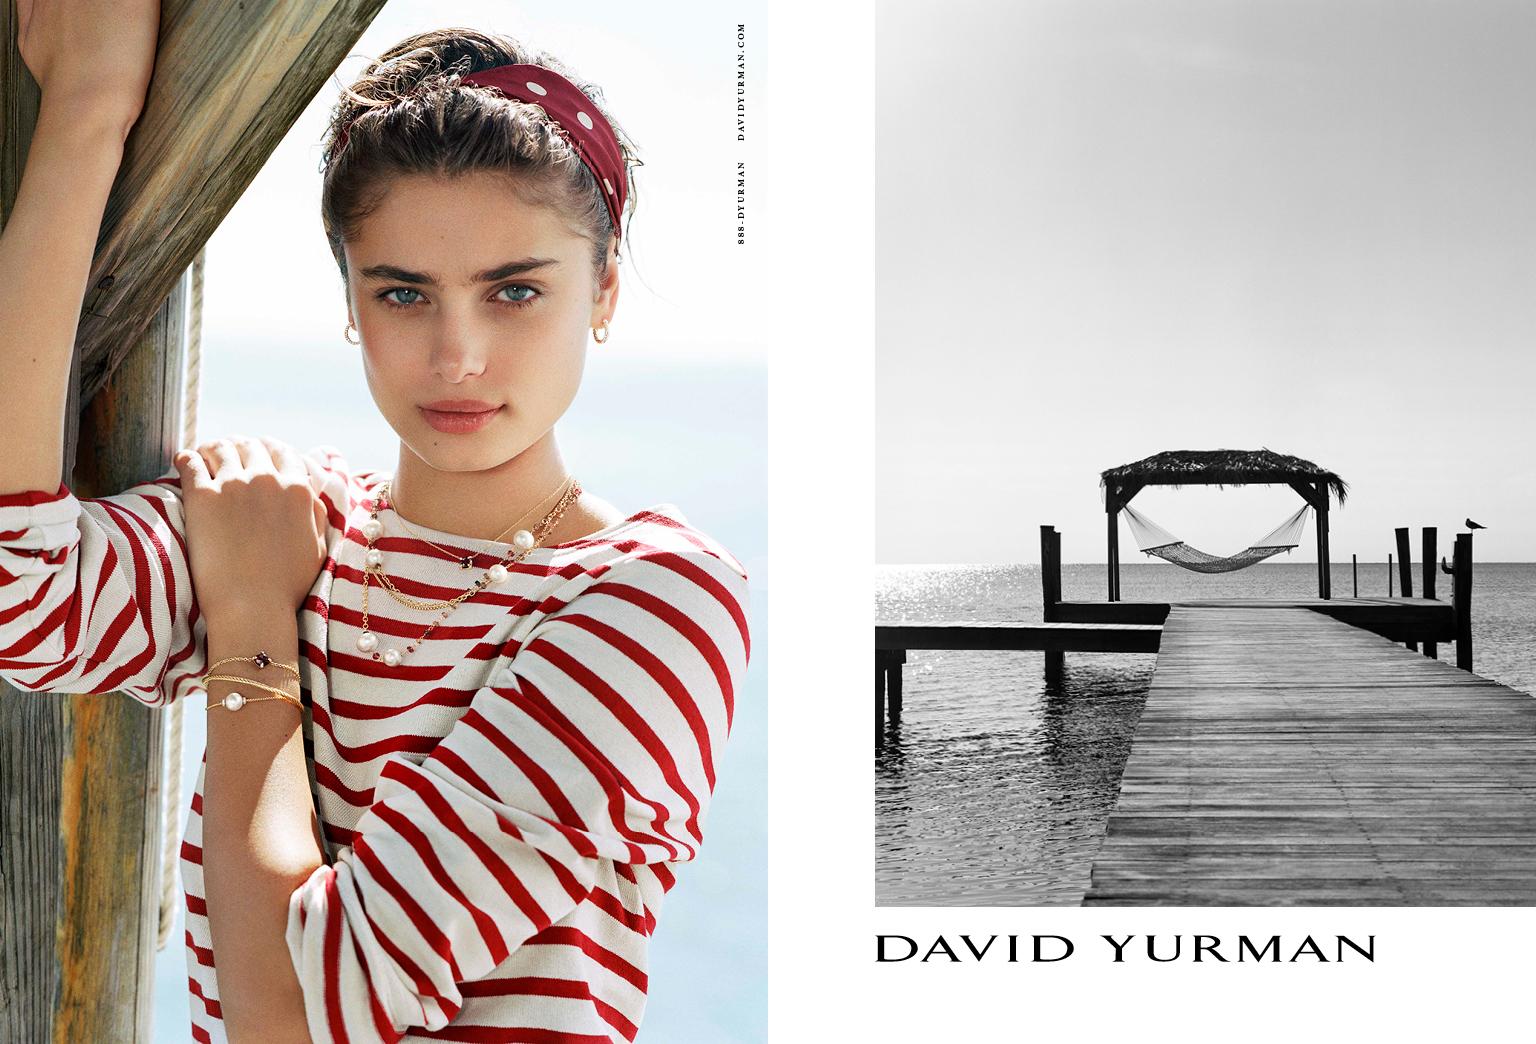 Client: David Yurman Season: Spring / Summer 2017 Photography: Bruce Weber Art Director: Sam Shahid Models: Natalia Vodianova, Taylor Hill Product: Pearls